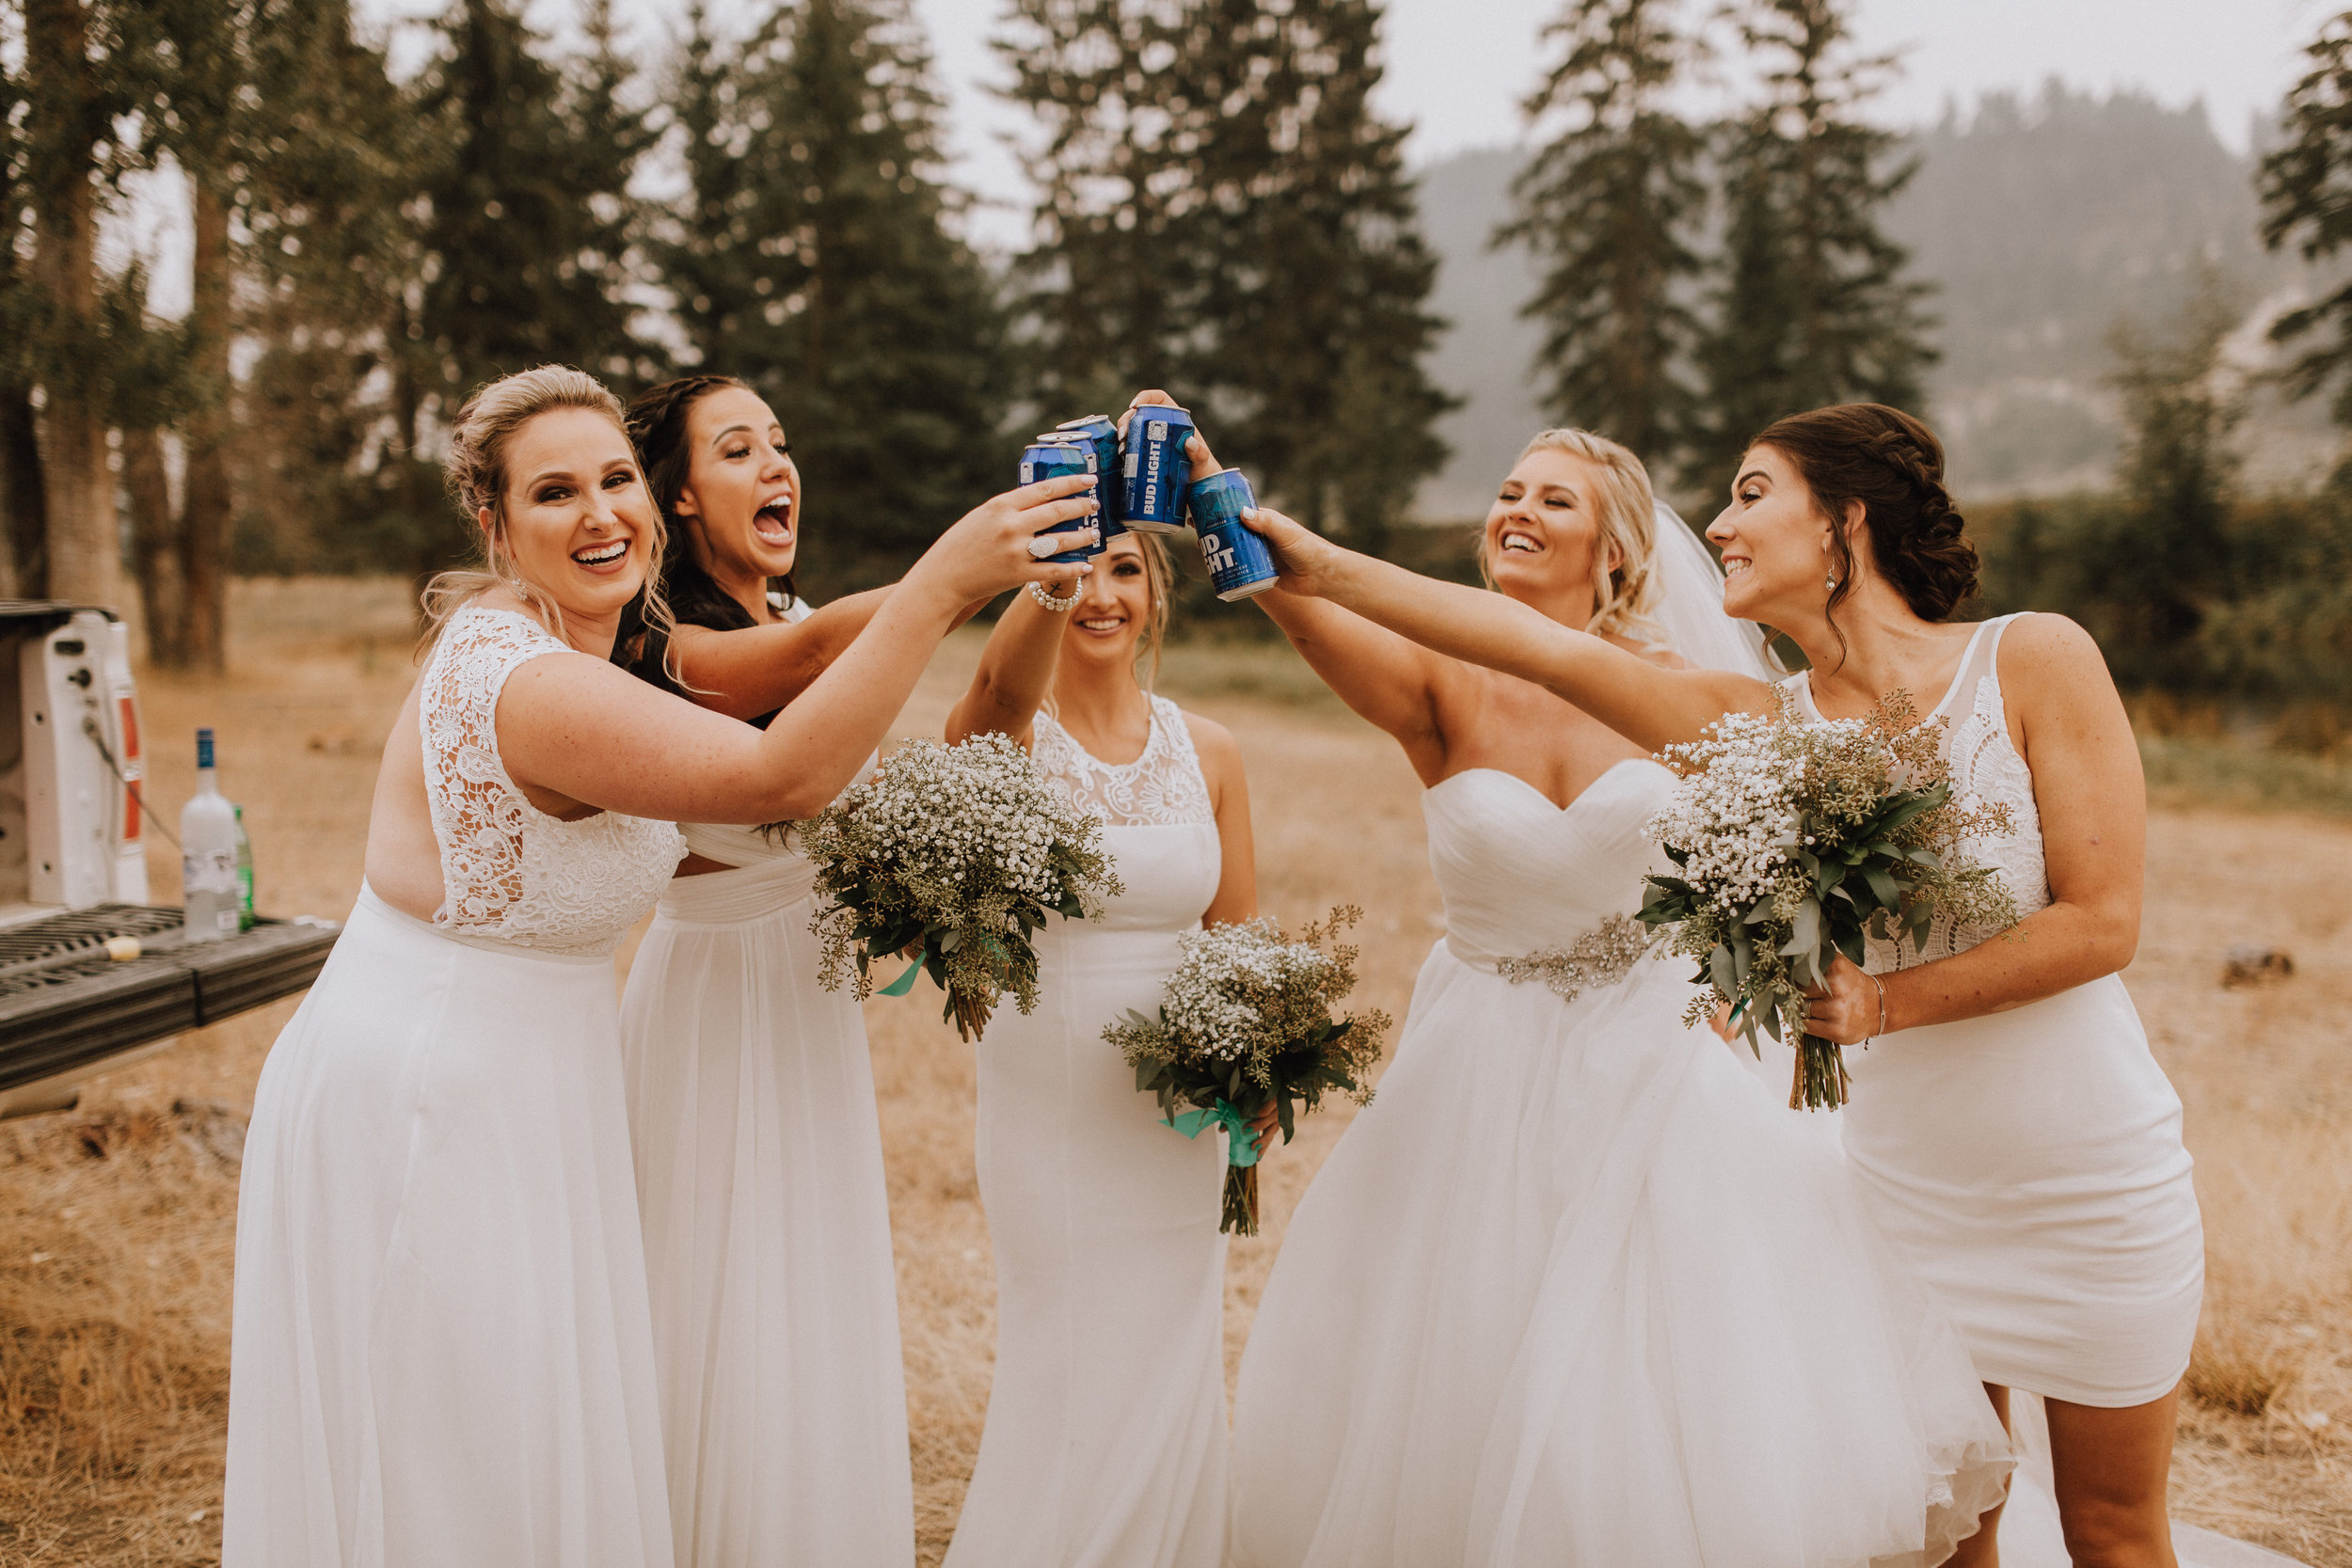 Tyler + Shayla 4 - Bridal Portraits-8.jpg